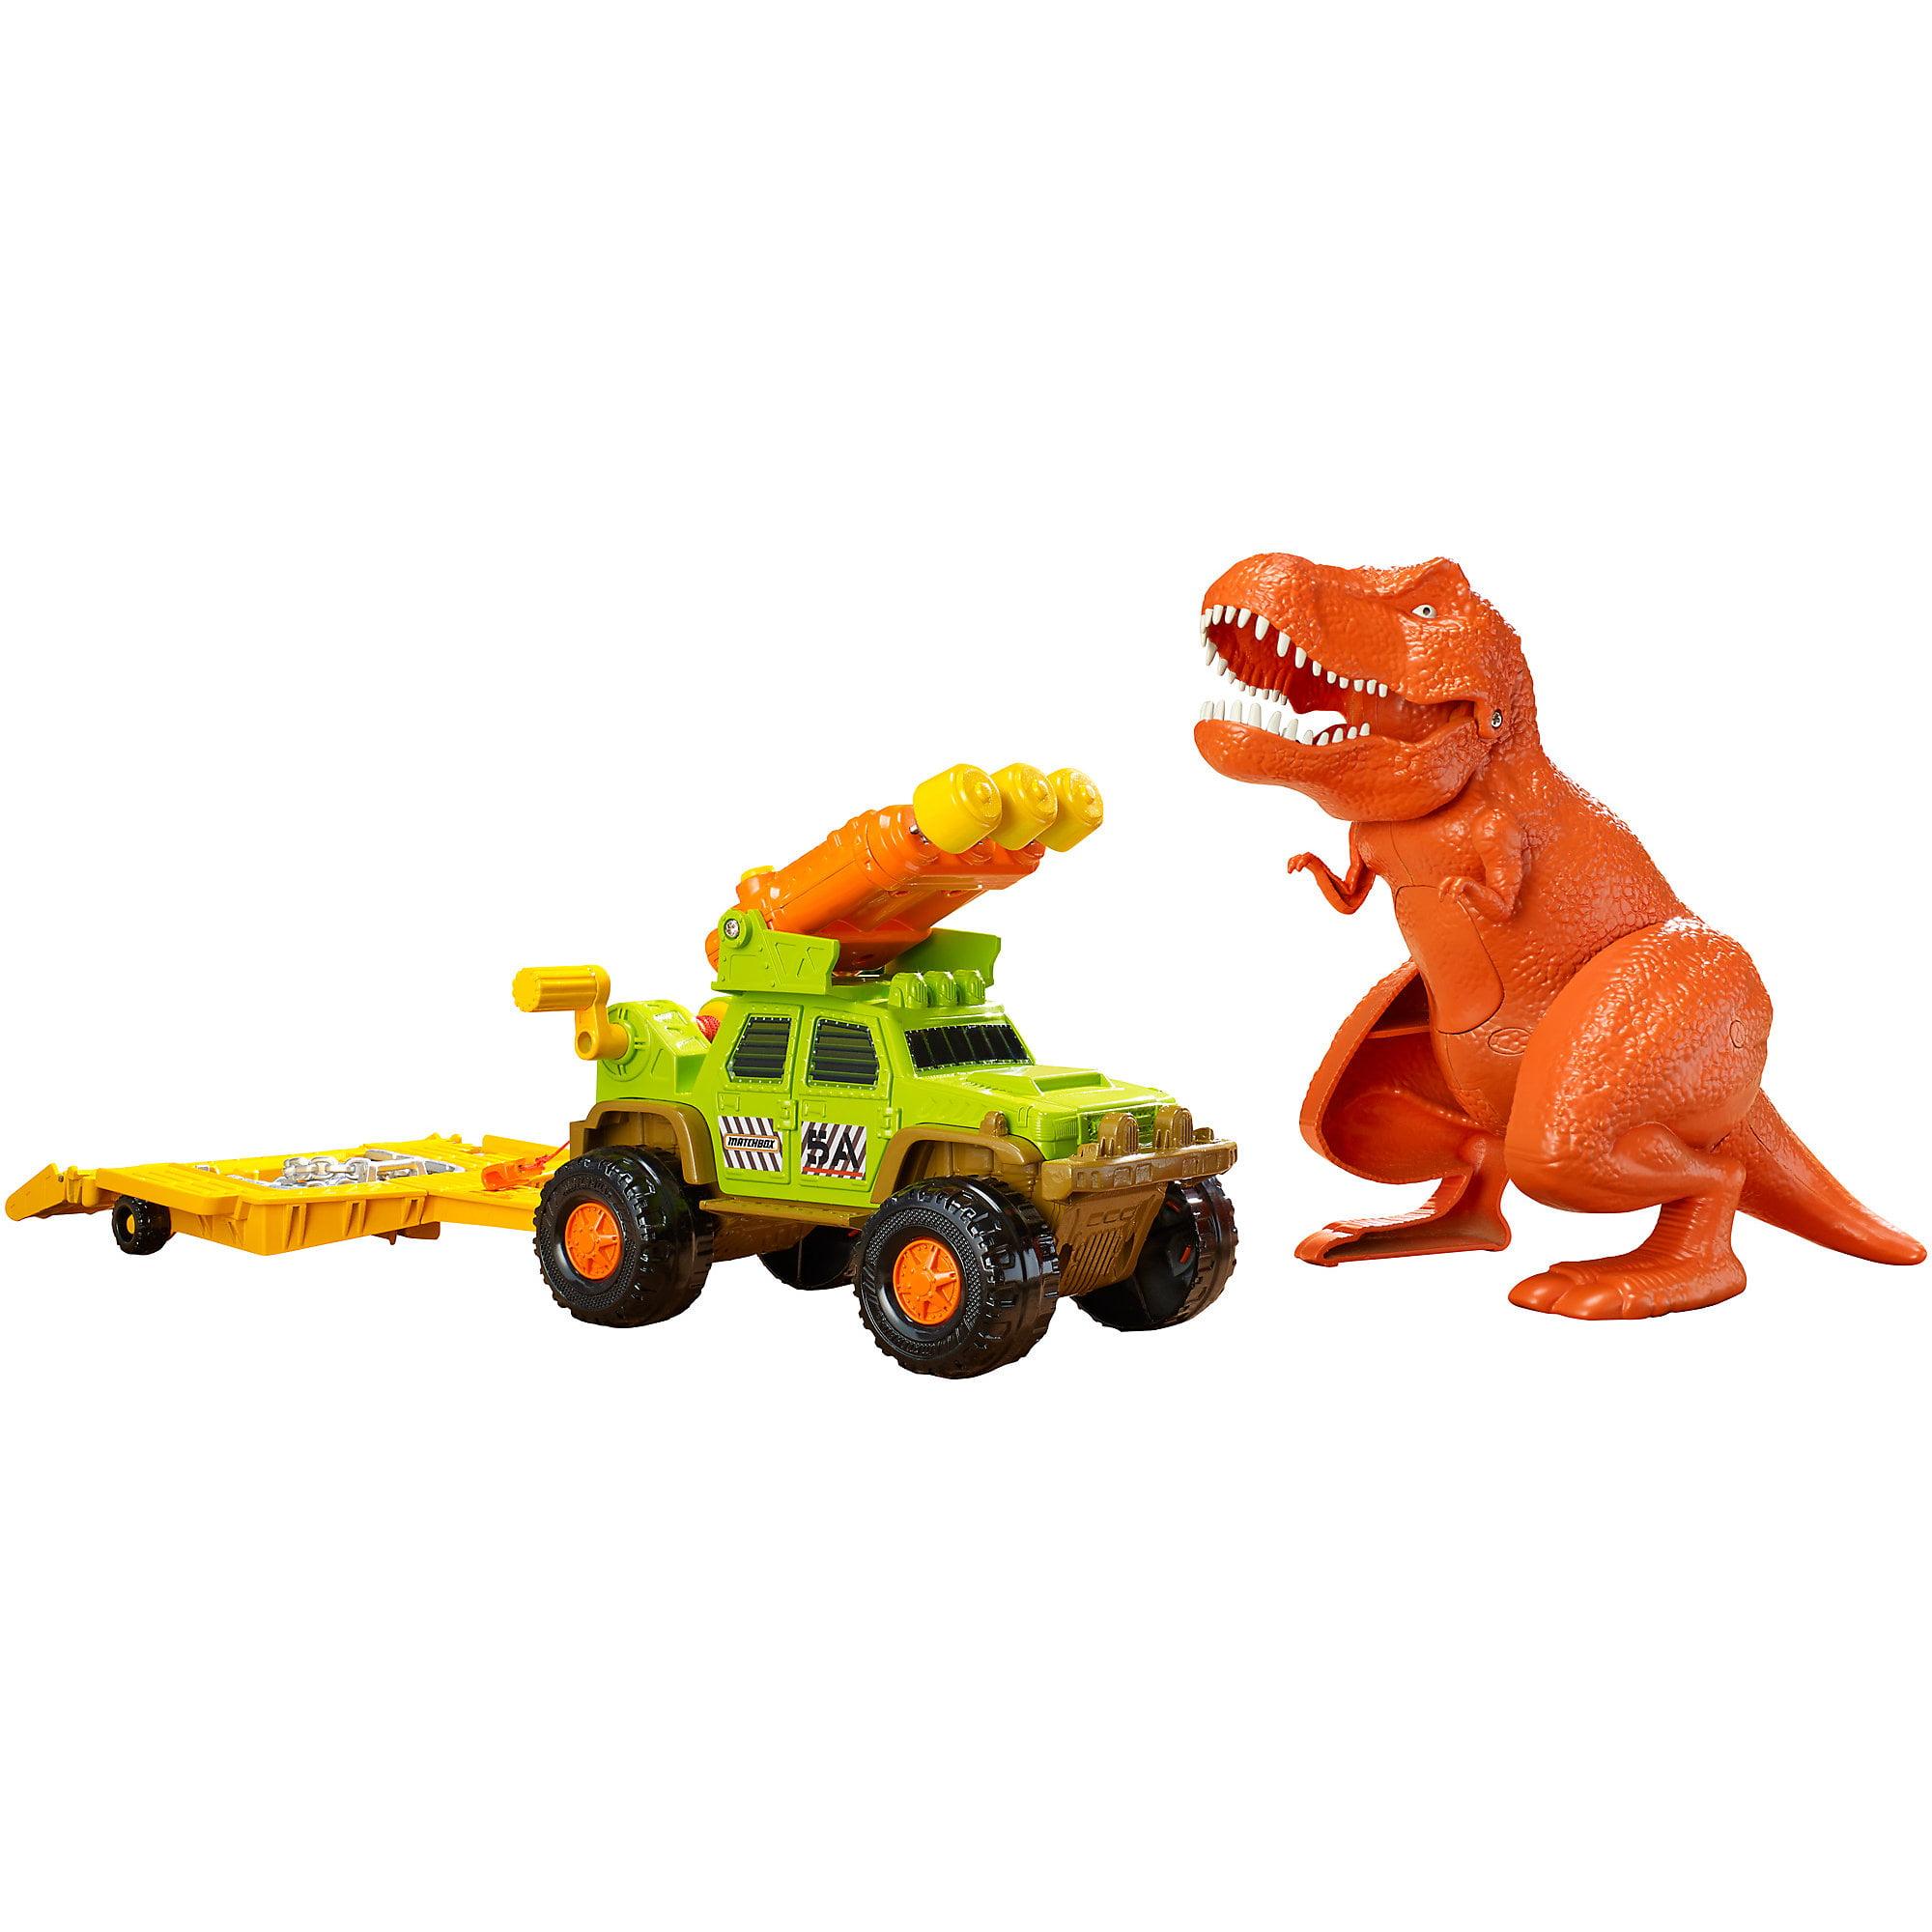 Matchbox Dino Trapper Trailer by Mattel